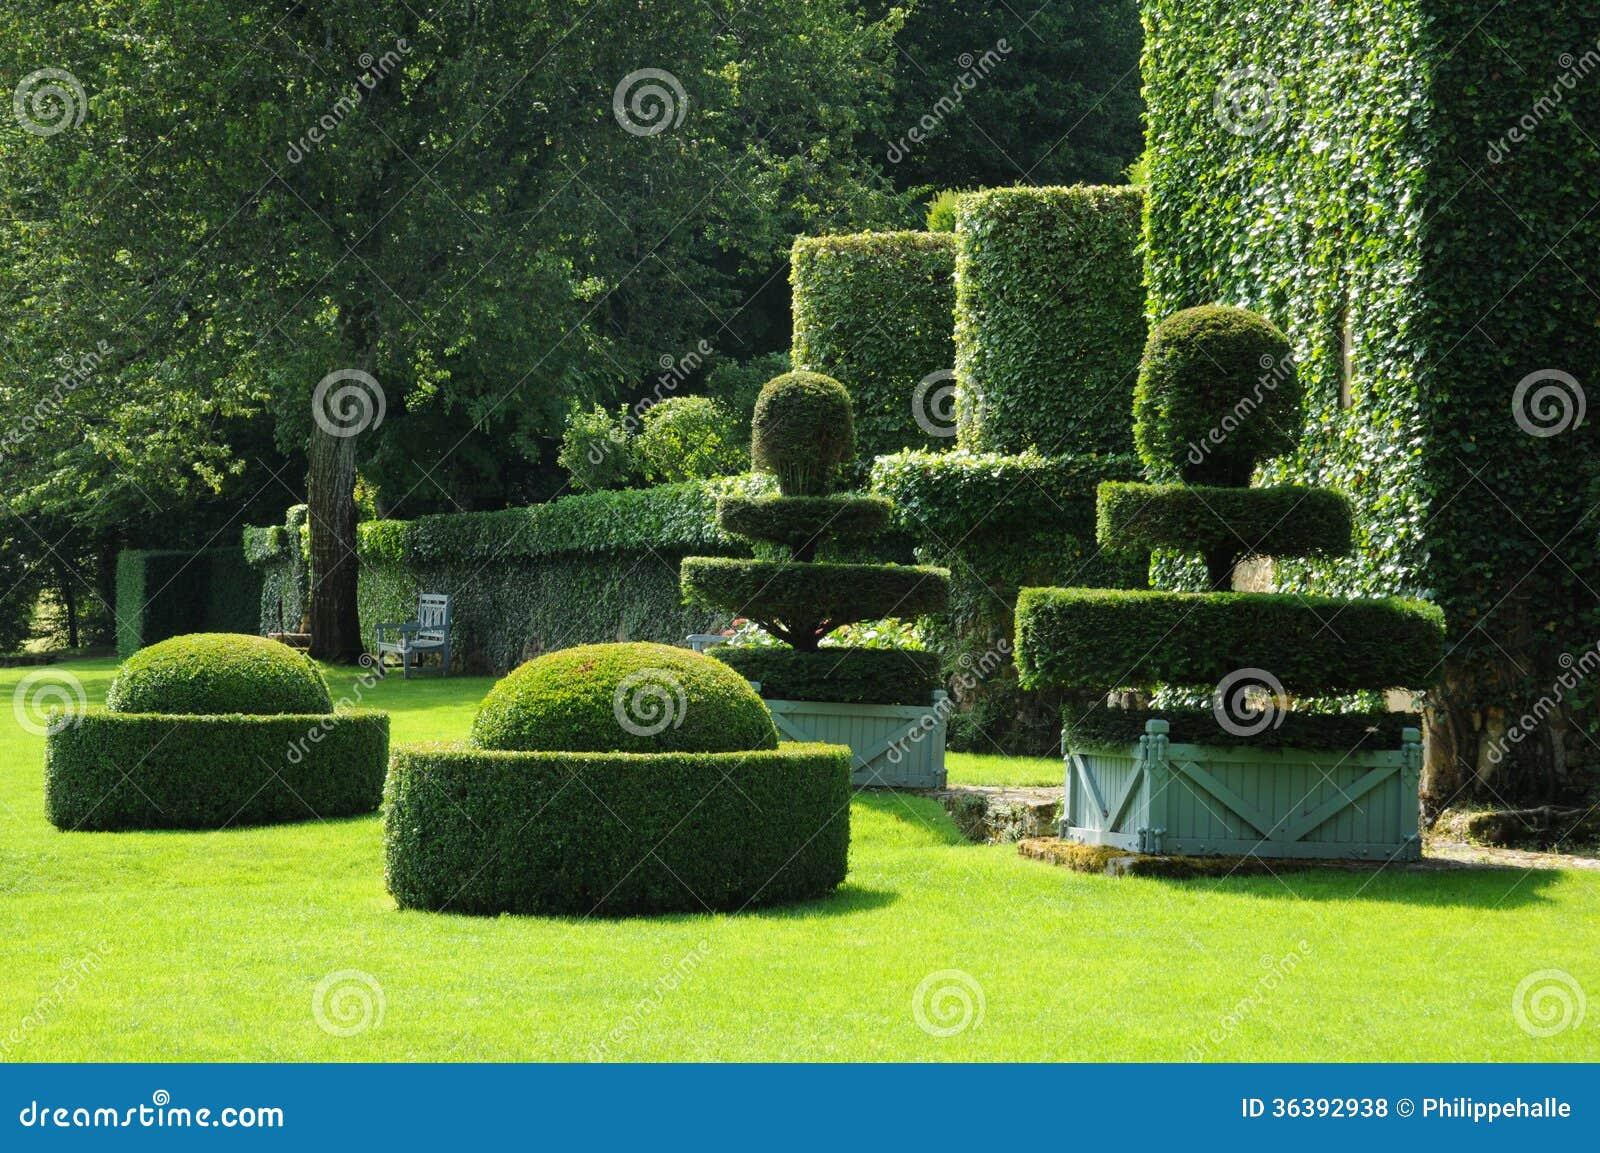 Picturesque jardins du manoir d eyrignac in dordogne royalty free stock photos image 36392938 - Jardins du manoir d eyrignac ...